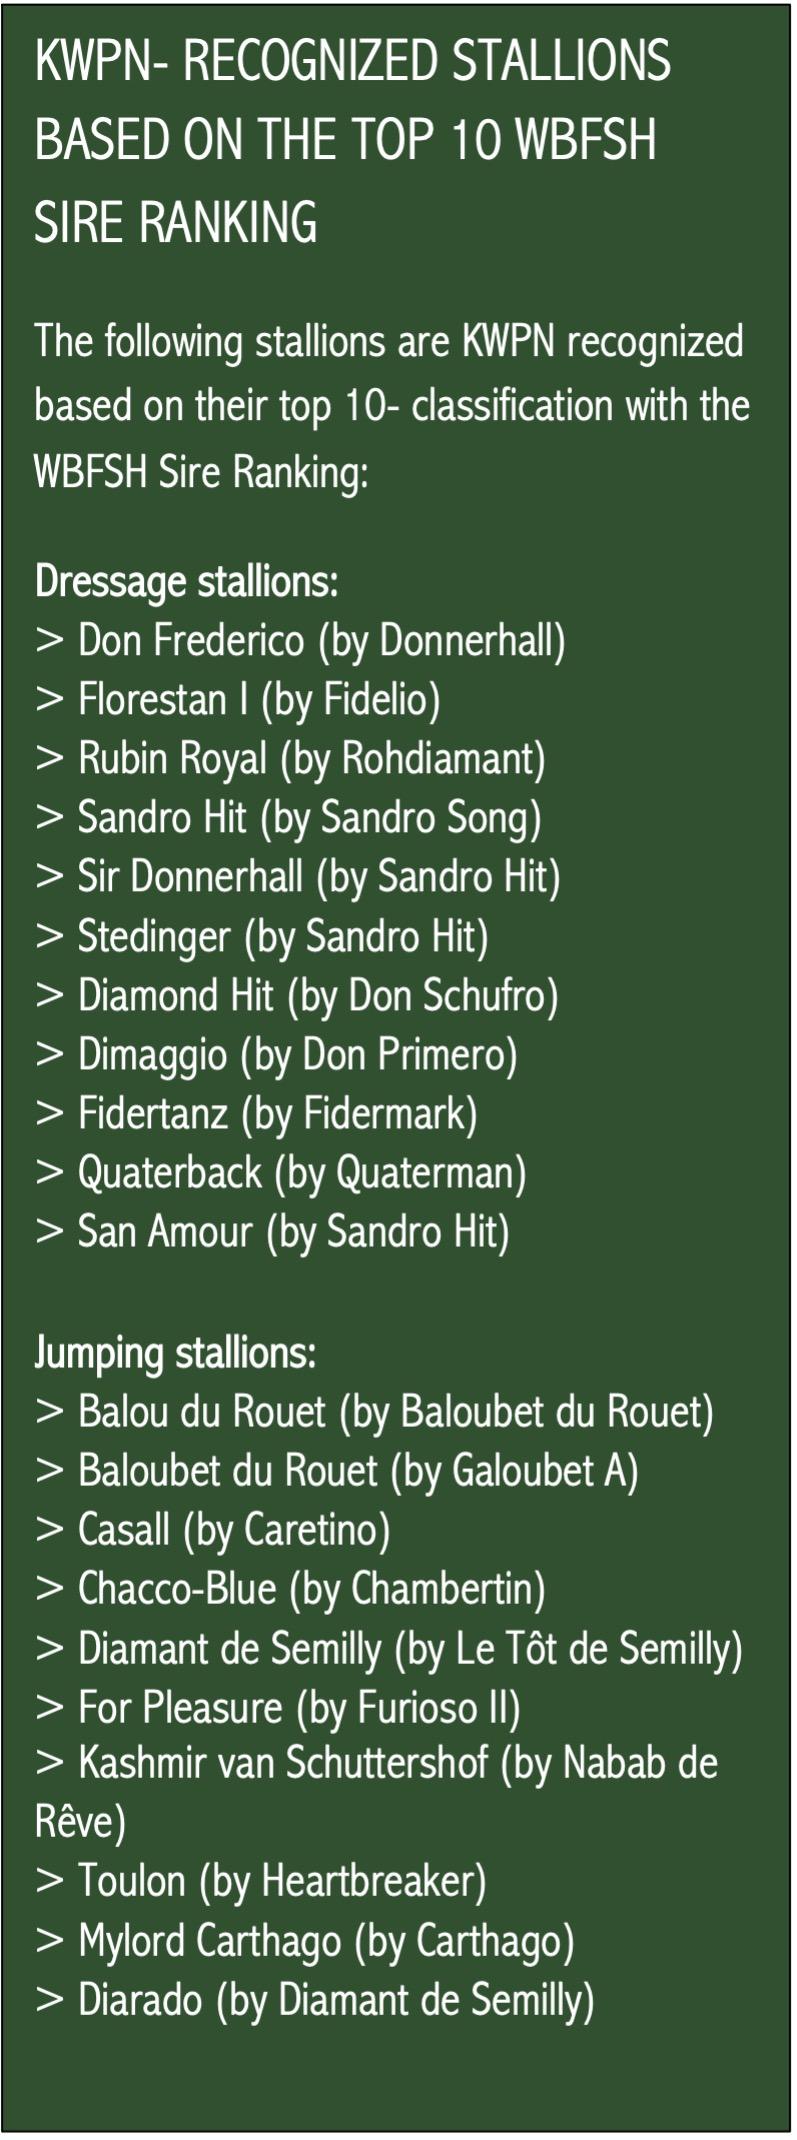 Top 10 WBFSH Sire Ranking